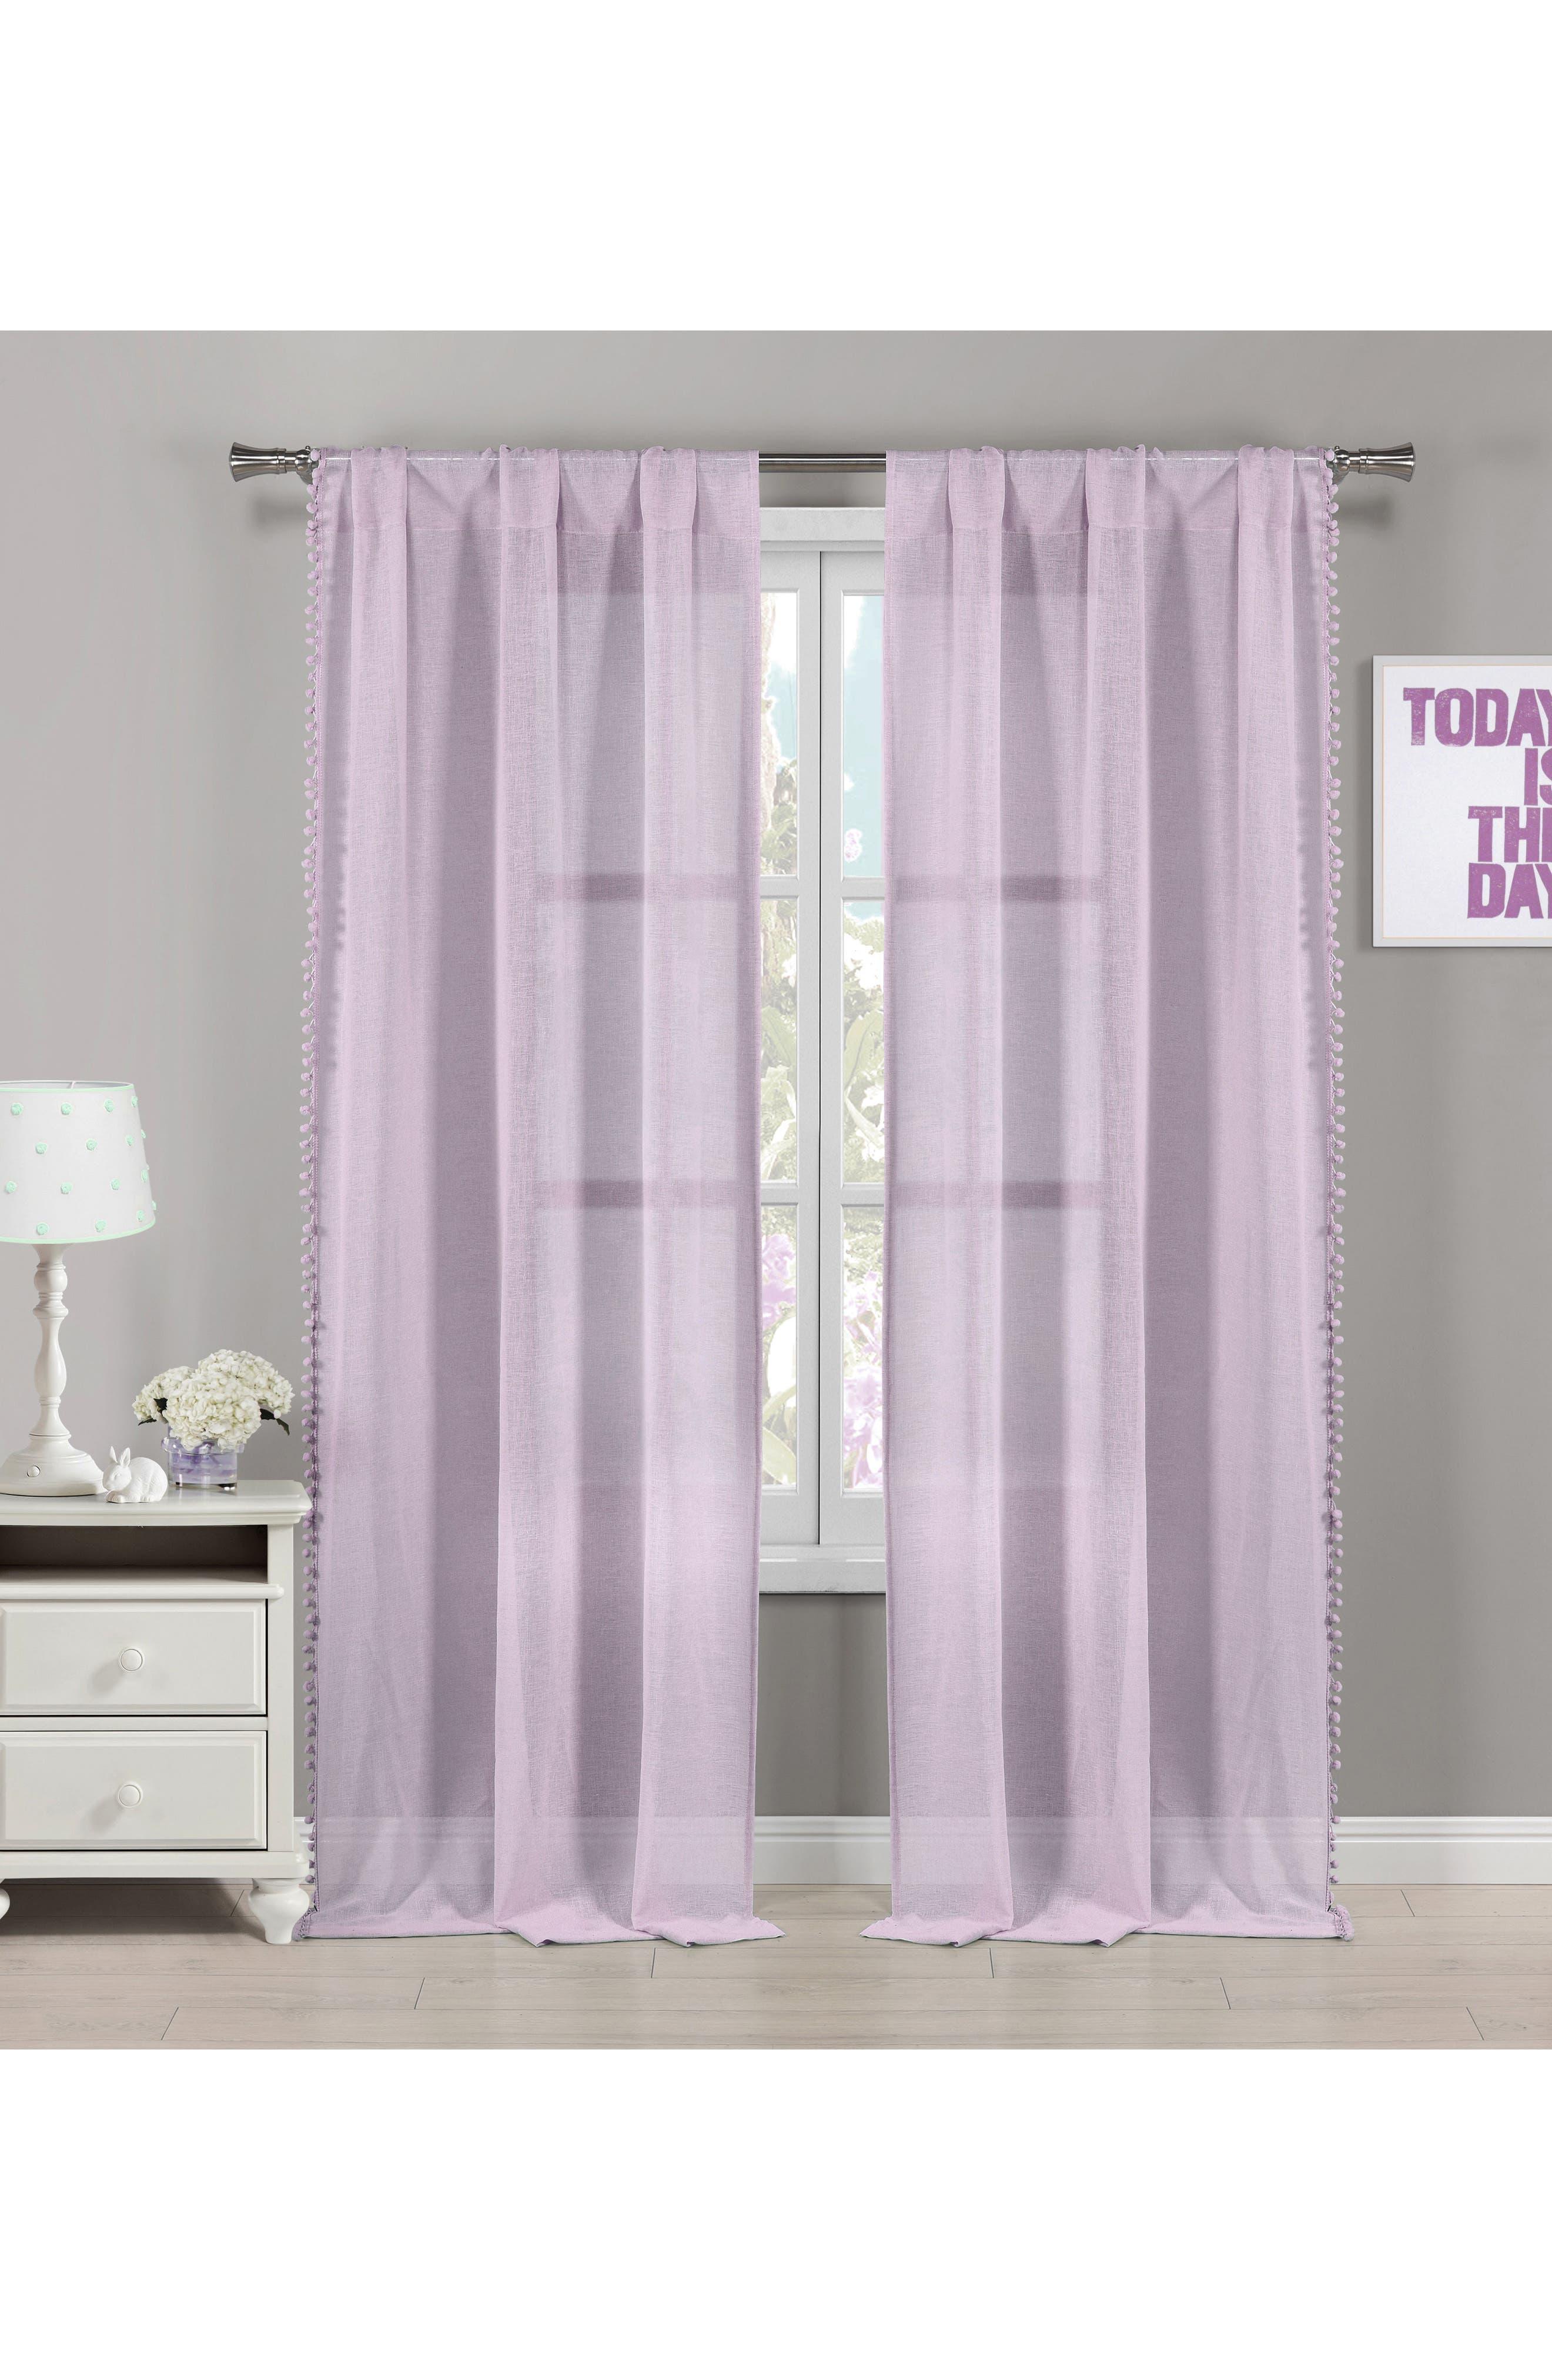 Main Image - LALA + BASH Addyson Sheer Pompom Window Panels